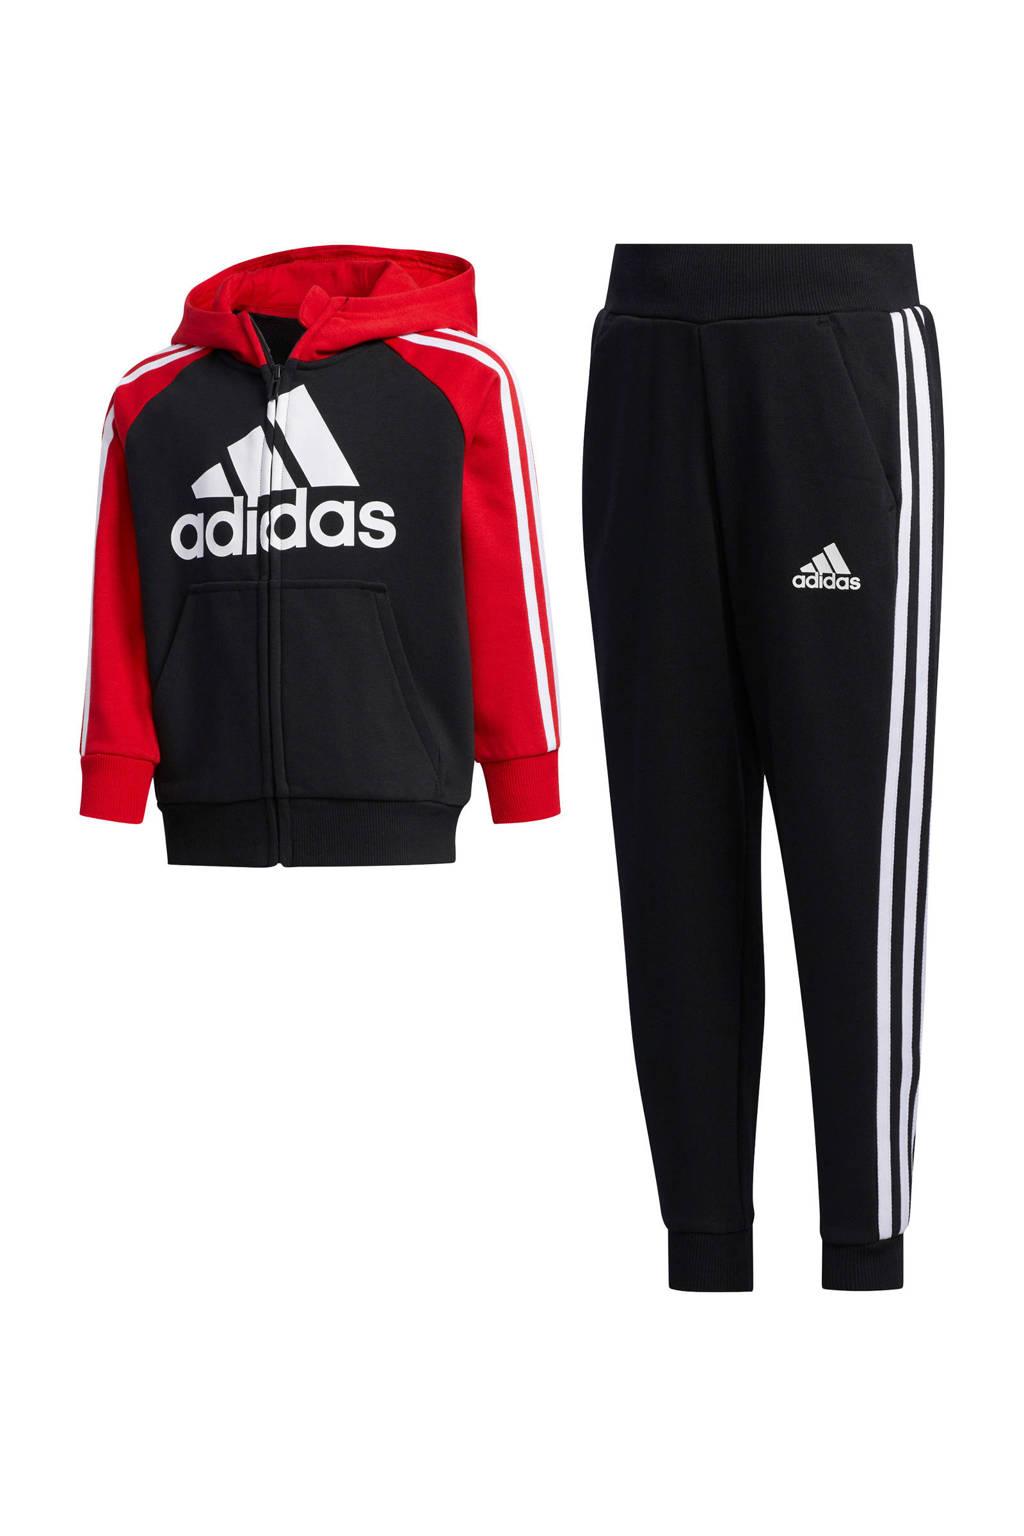 adidas Performance   joggingpak zwart/rood, Zwart/rood